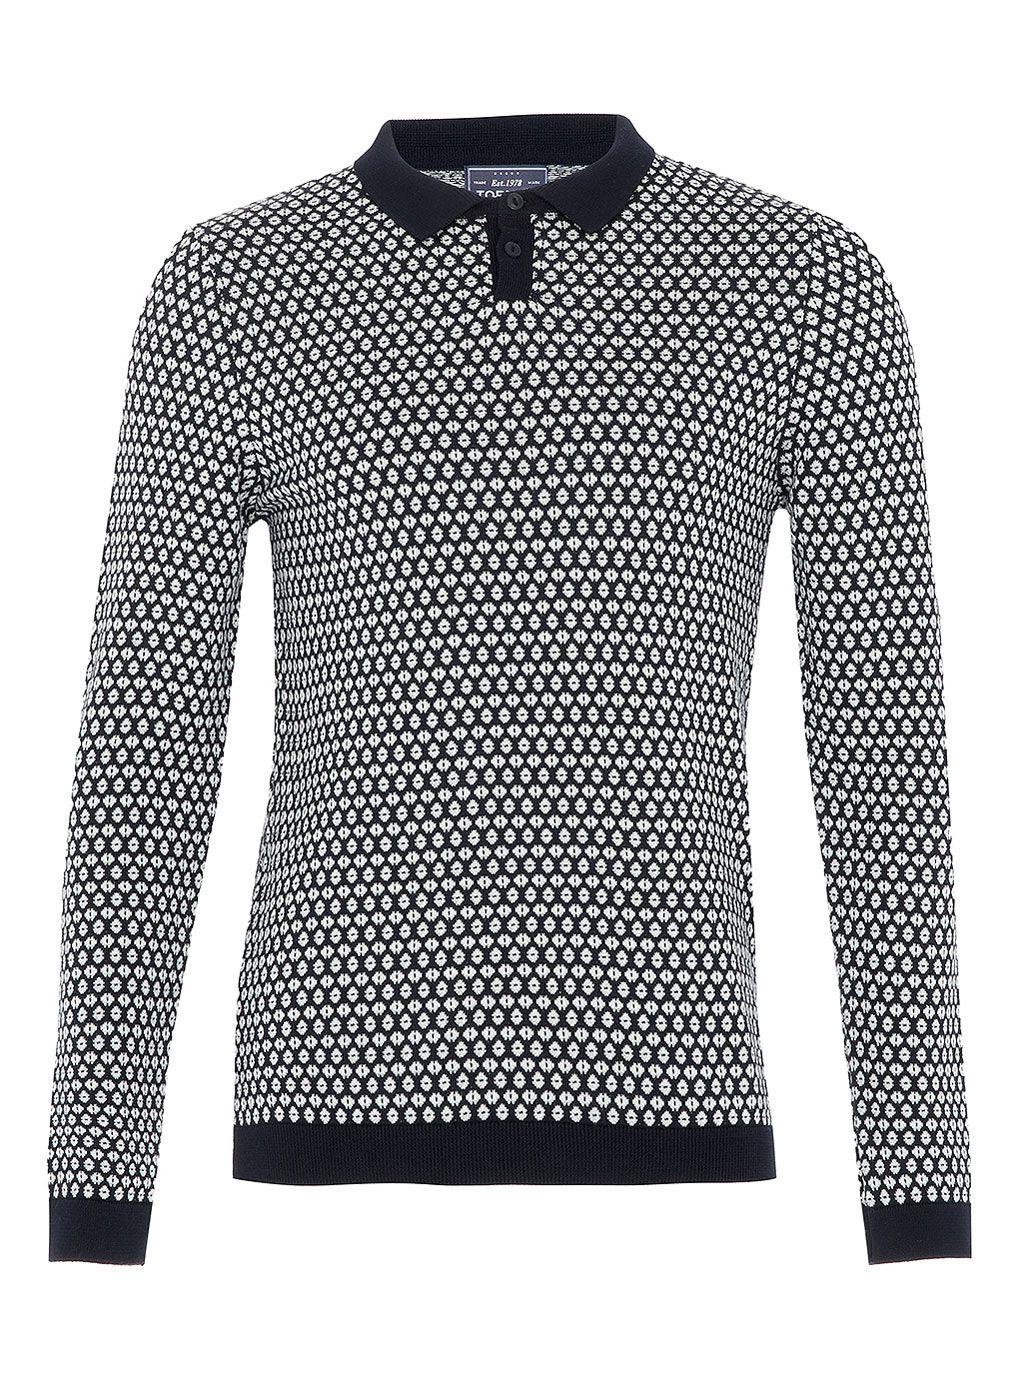 26abcc6601 Navy Diamond Pattern Polo Shirt - Mens Polo Shirts - Clothing - TOPMAN USA